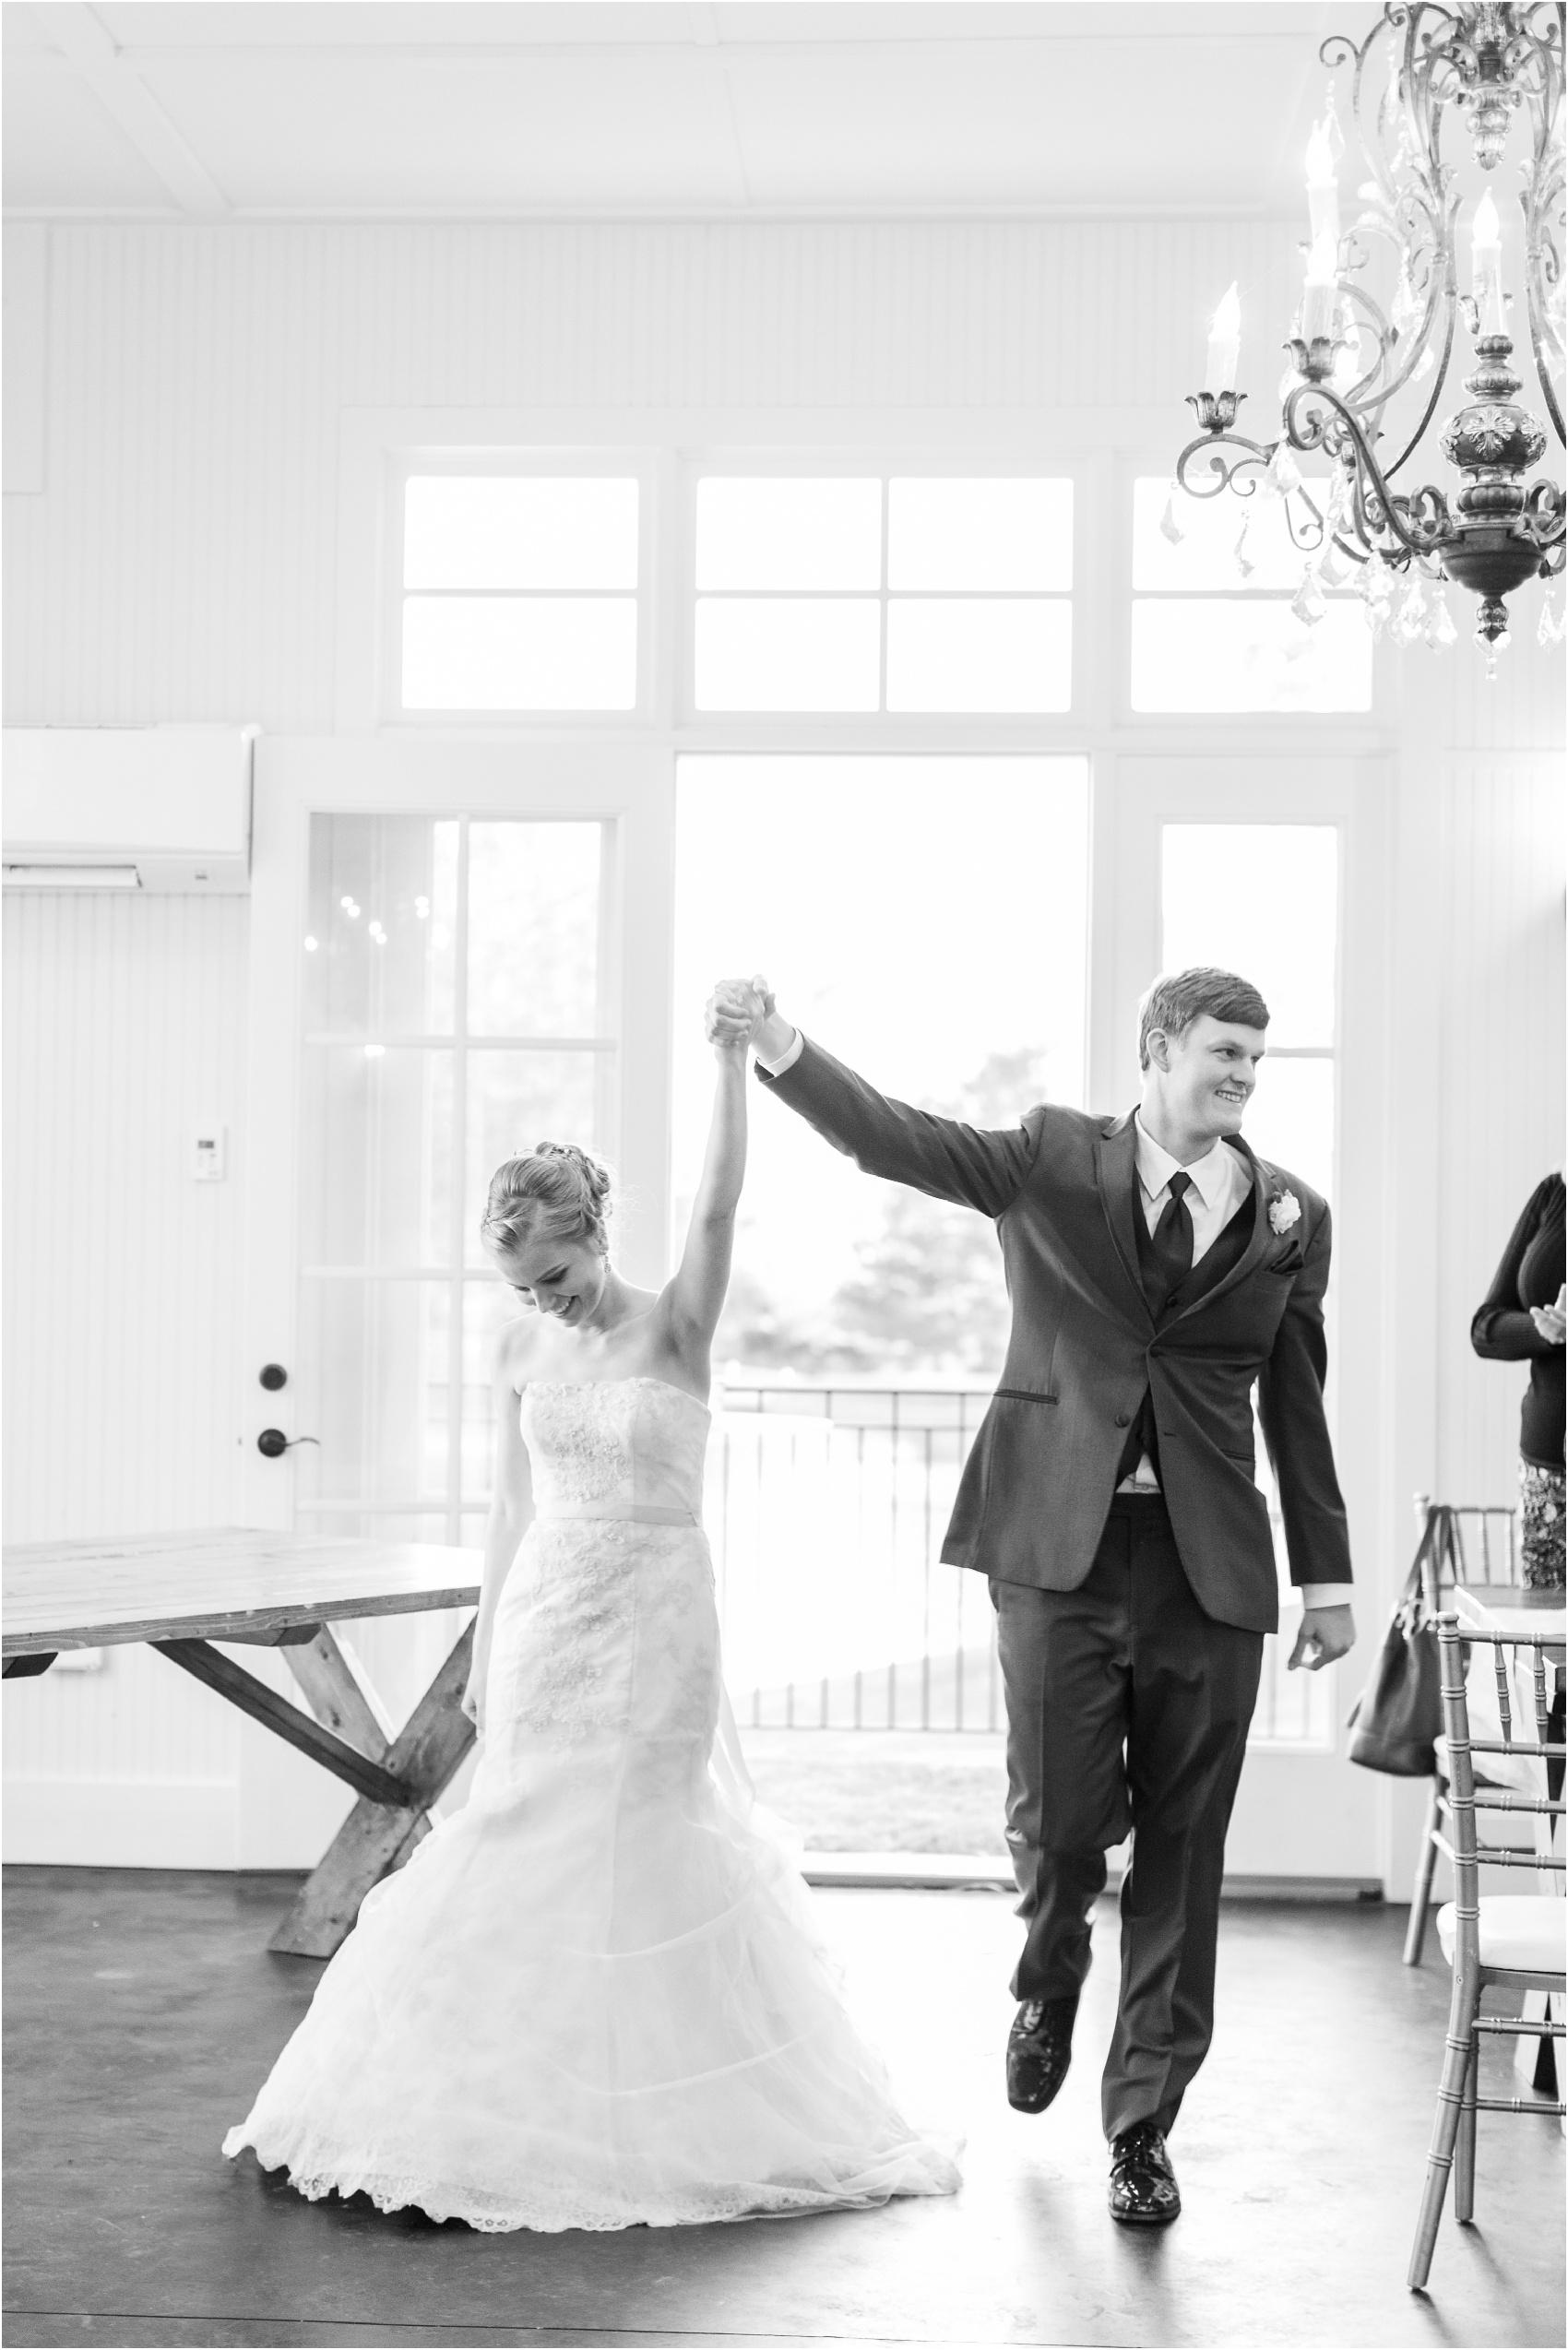 Savannah Eve Photography- Perkins Wedding- Blog-31.jpg